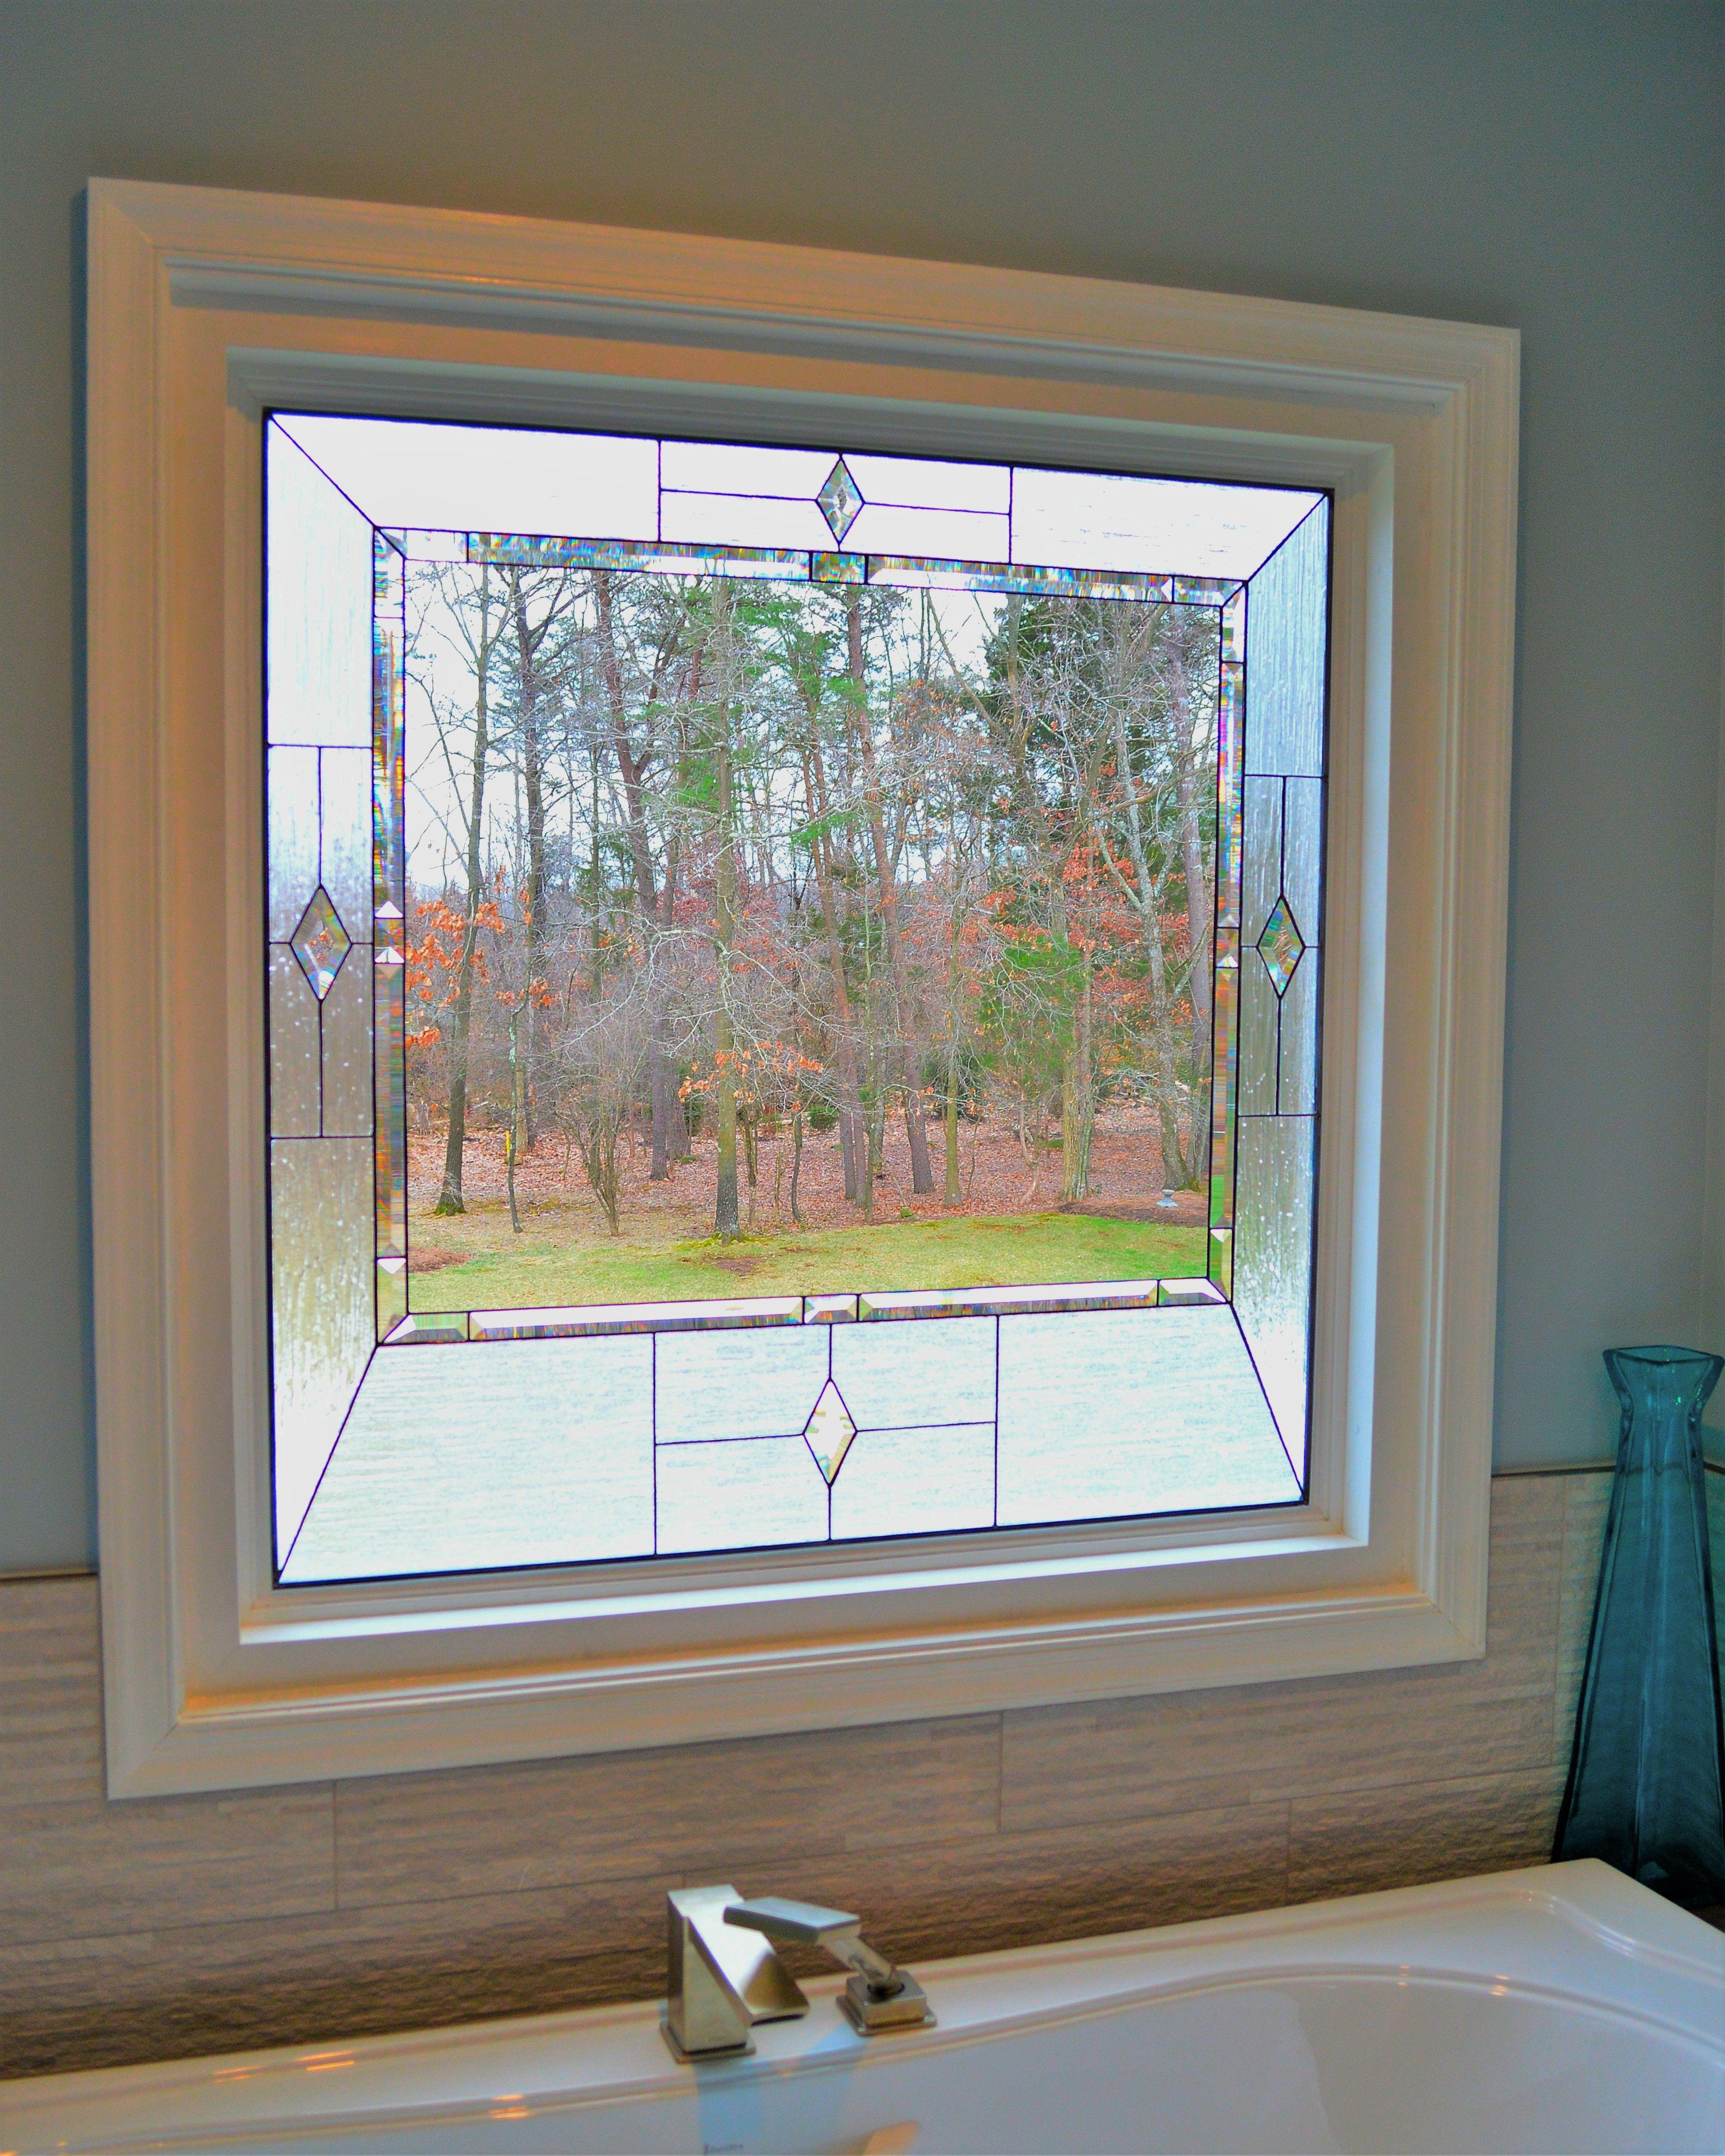 decorative glass bathroom windows traditional combo haalstead bath stained glass window panel  stained glass window